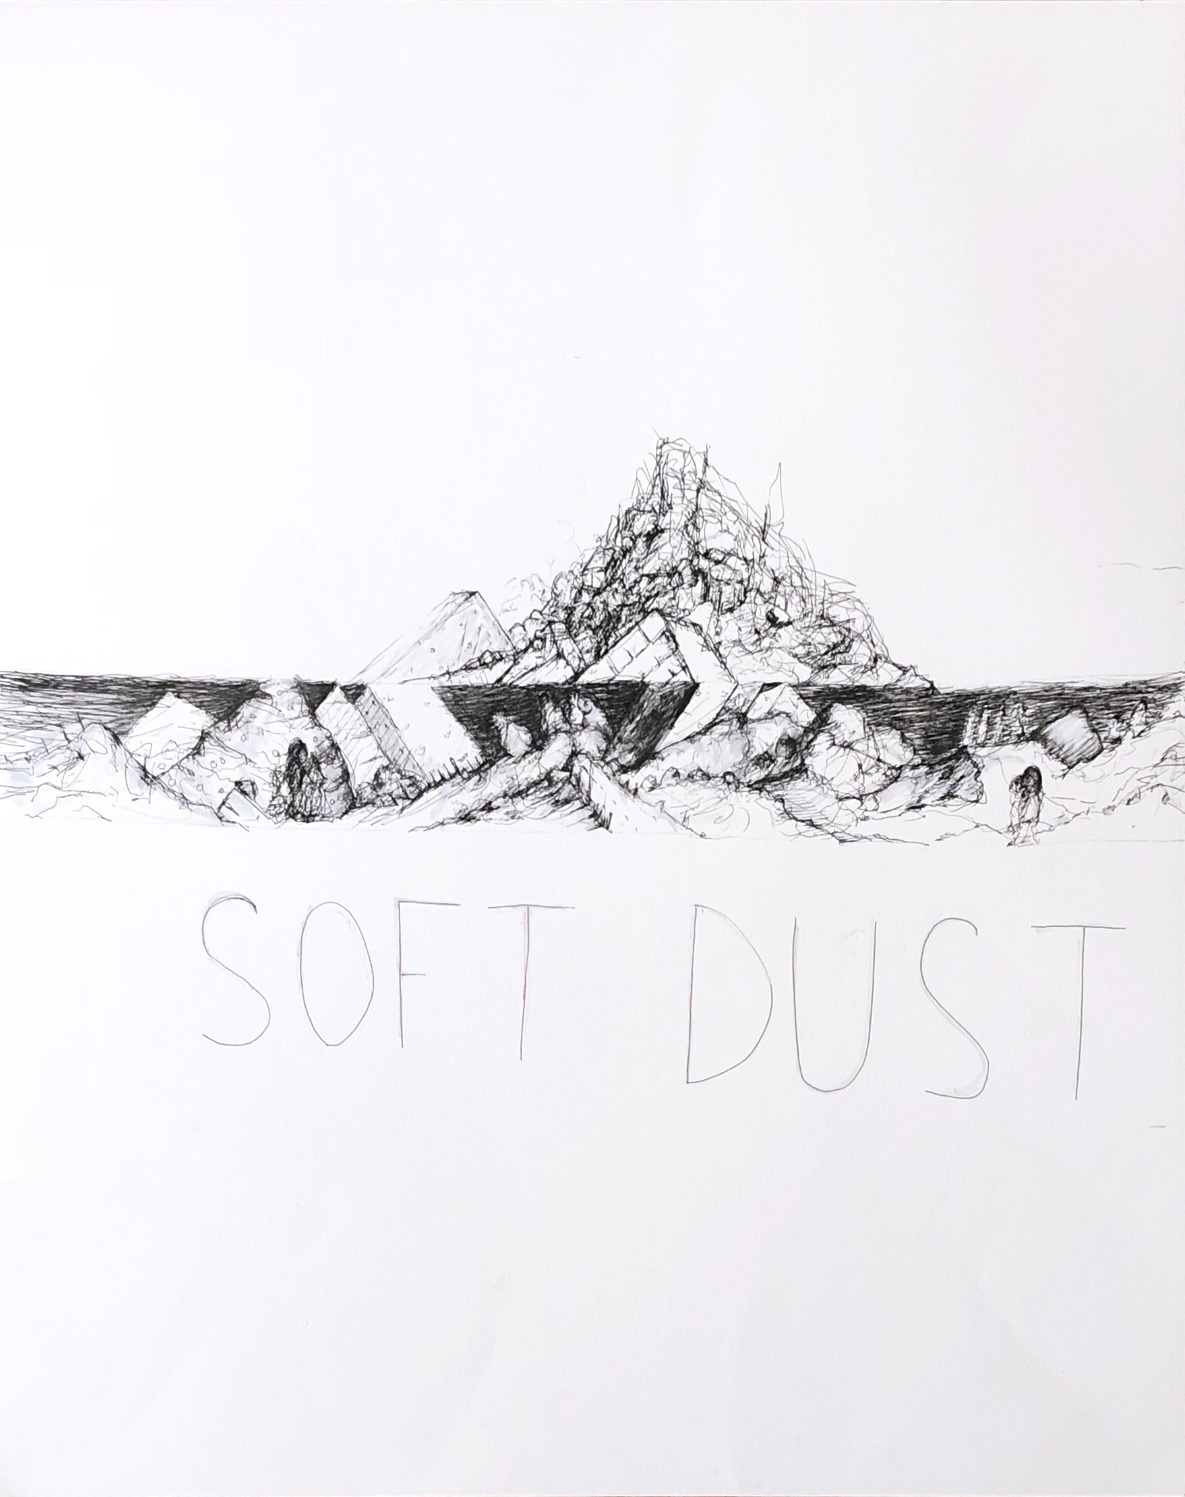 Soft Dust (543 2/15)